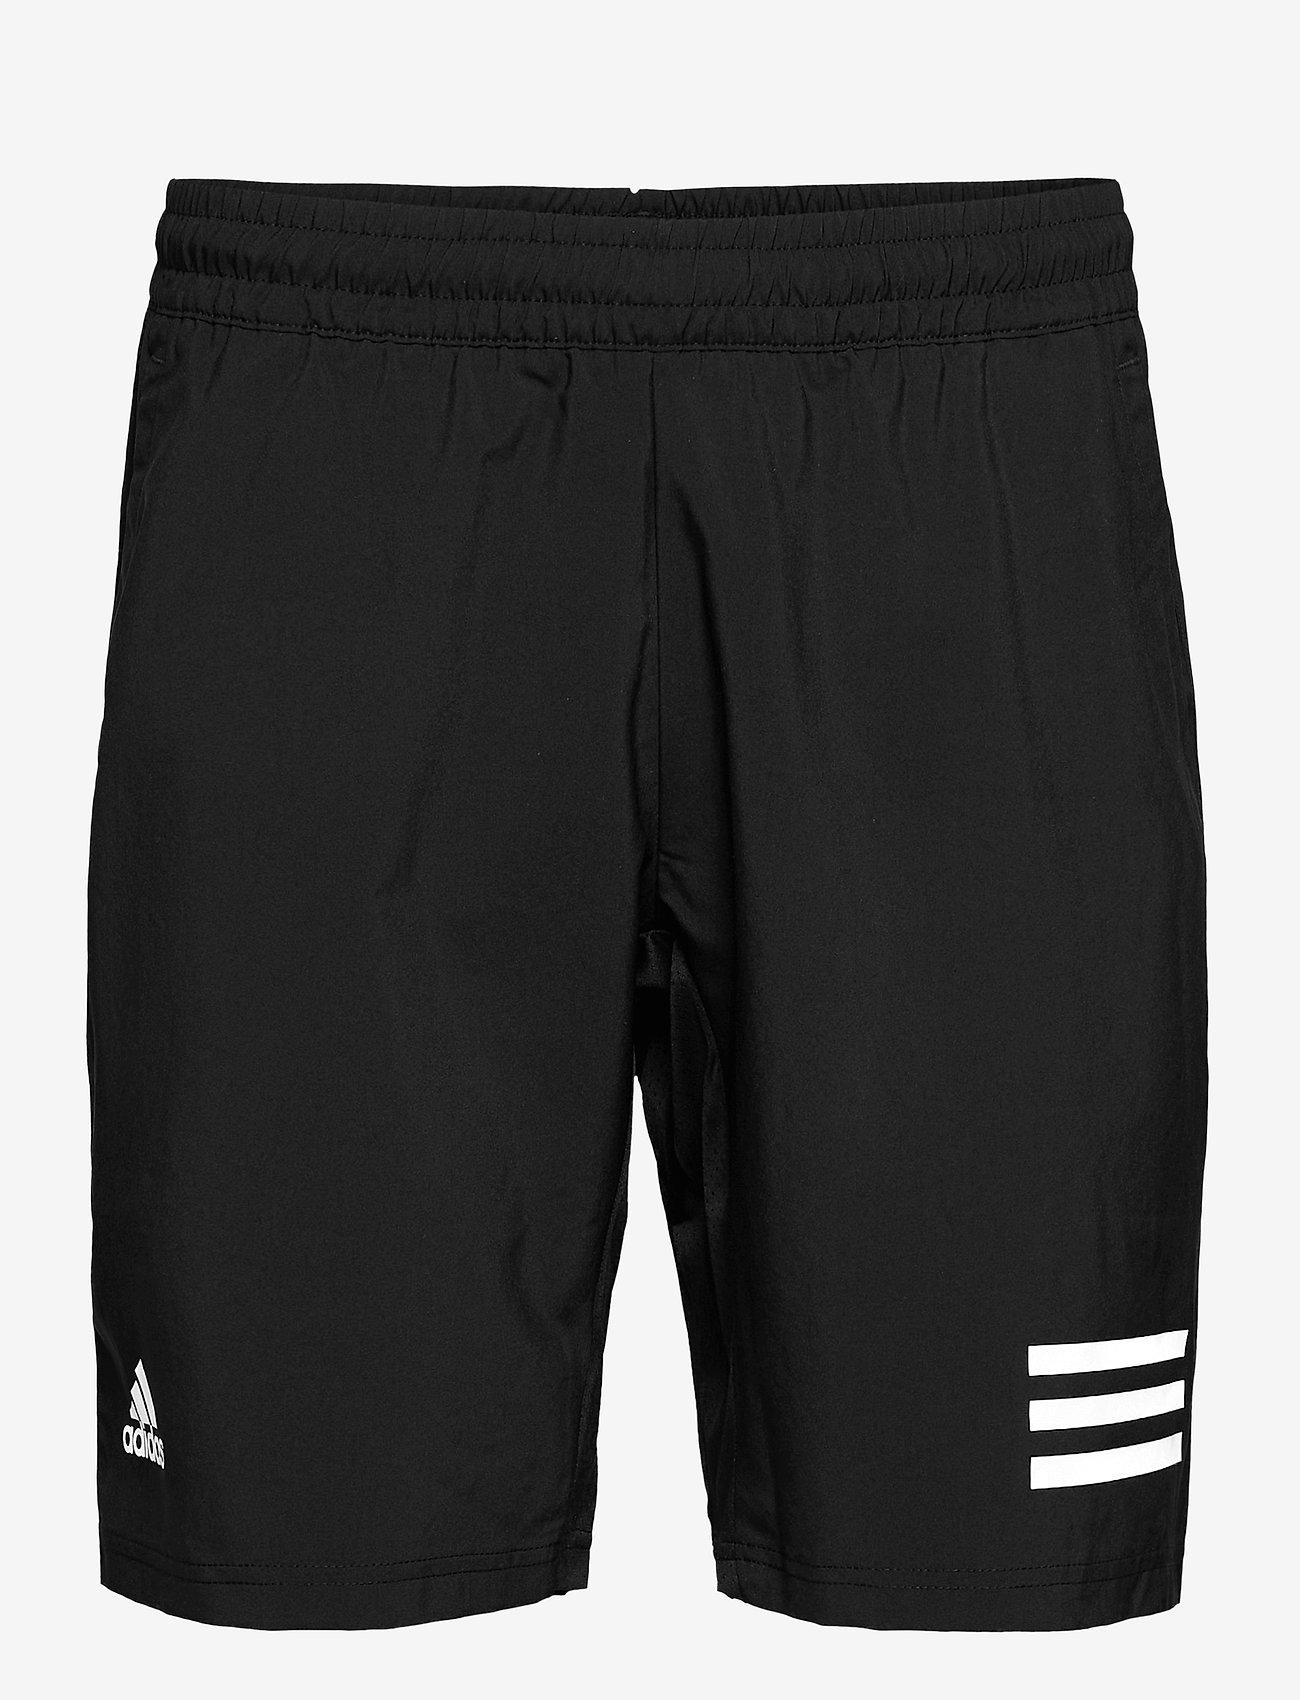 adidas Performance - CLUB 3-STRIPE SHORTS - trainingsshorts - black - 0